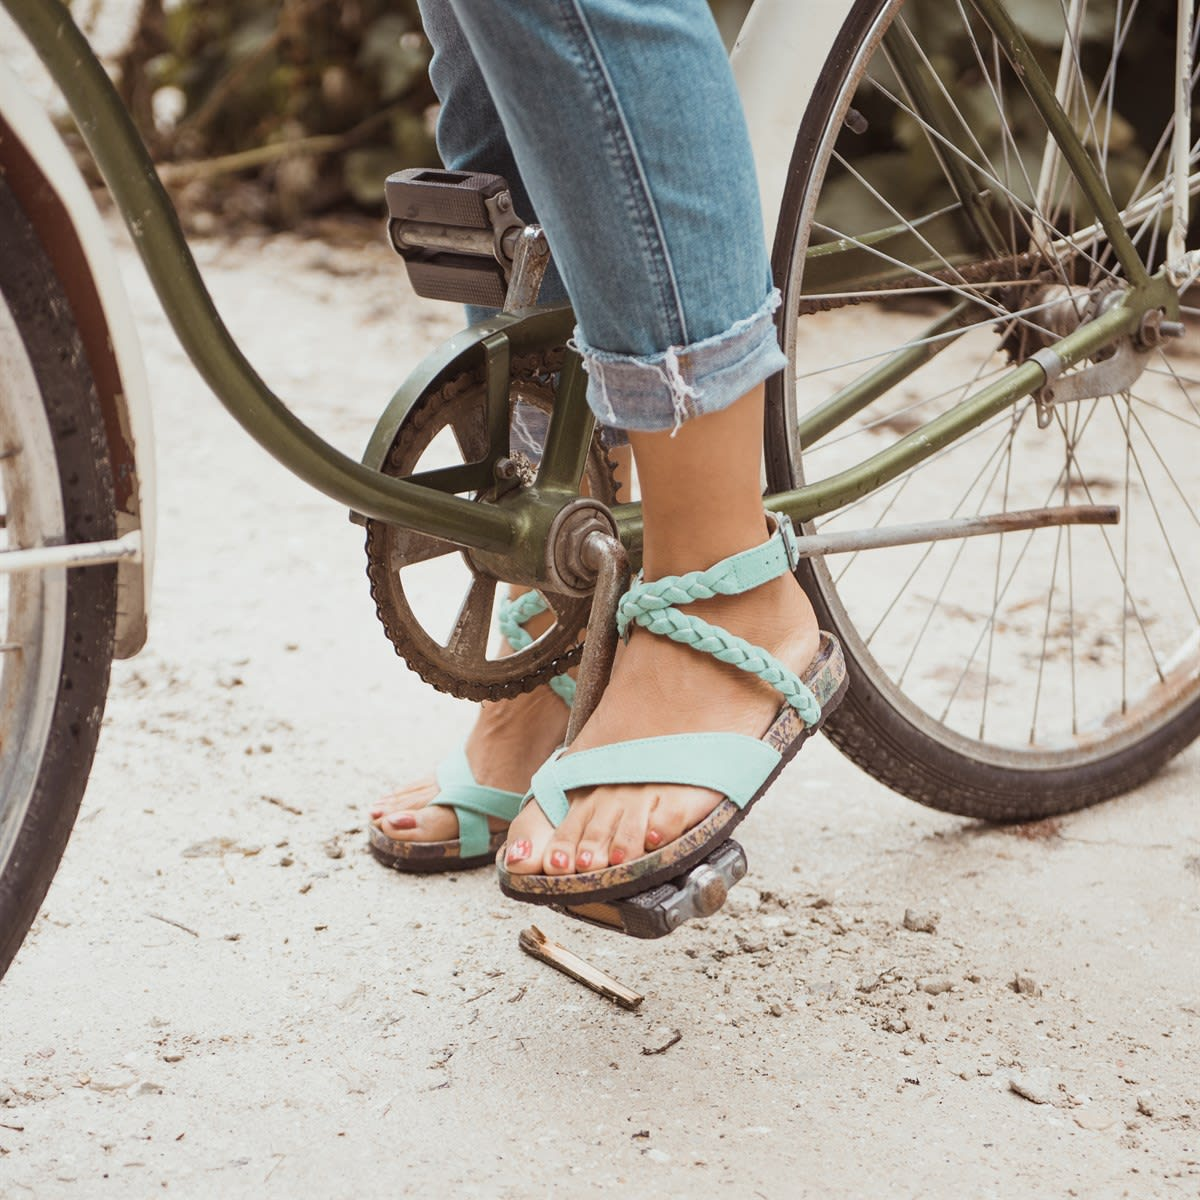 MUK LUKS Women's Estelle Sandals / Free Shipping